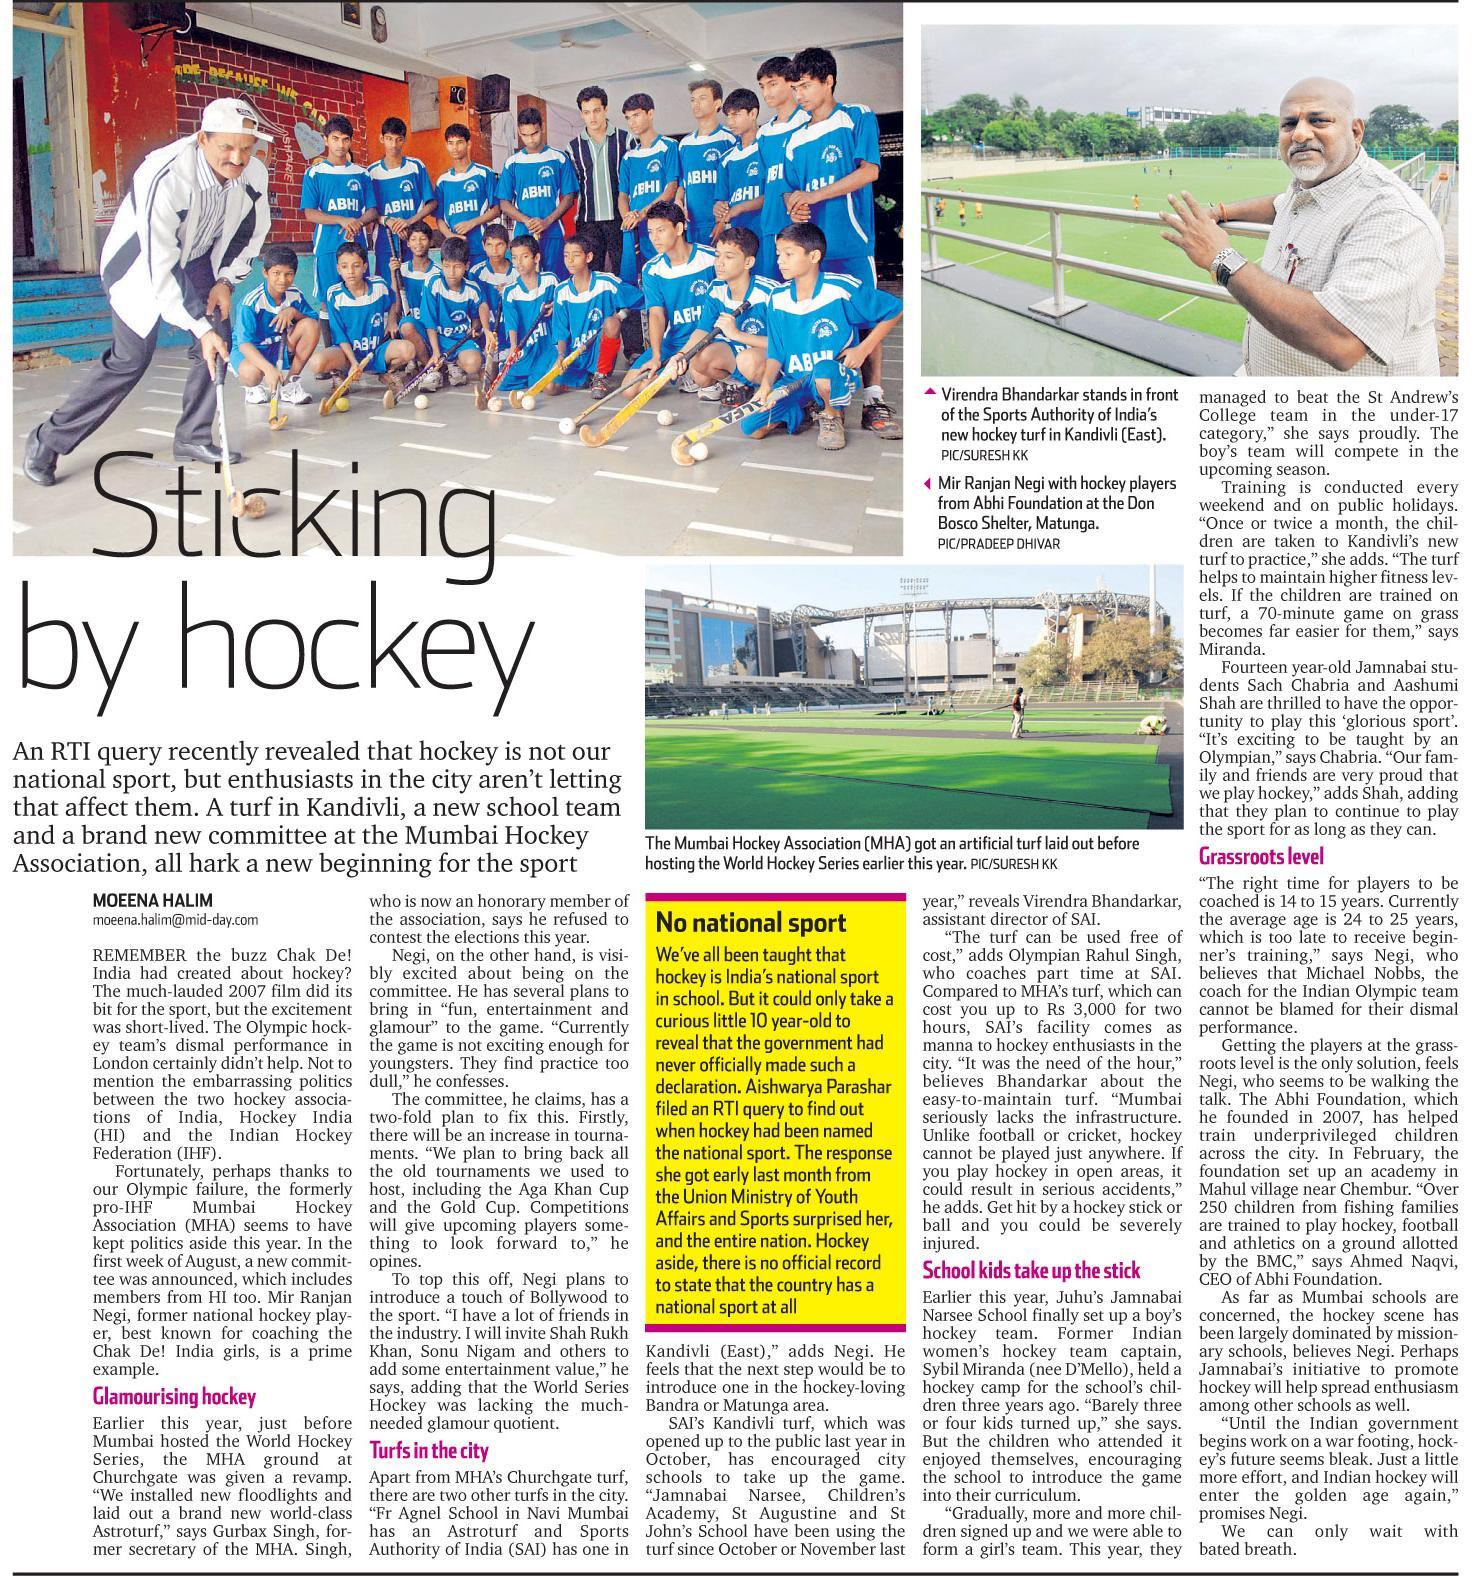 essays on cricket is glamorizing but our national game is hockey Offizielle website des fanfarenzuges der rennstadt hockenheim ev.